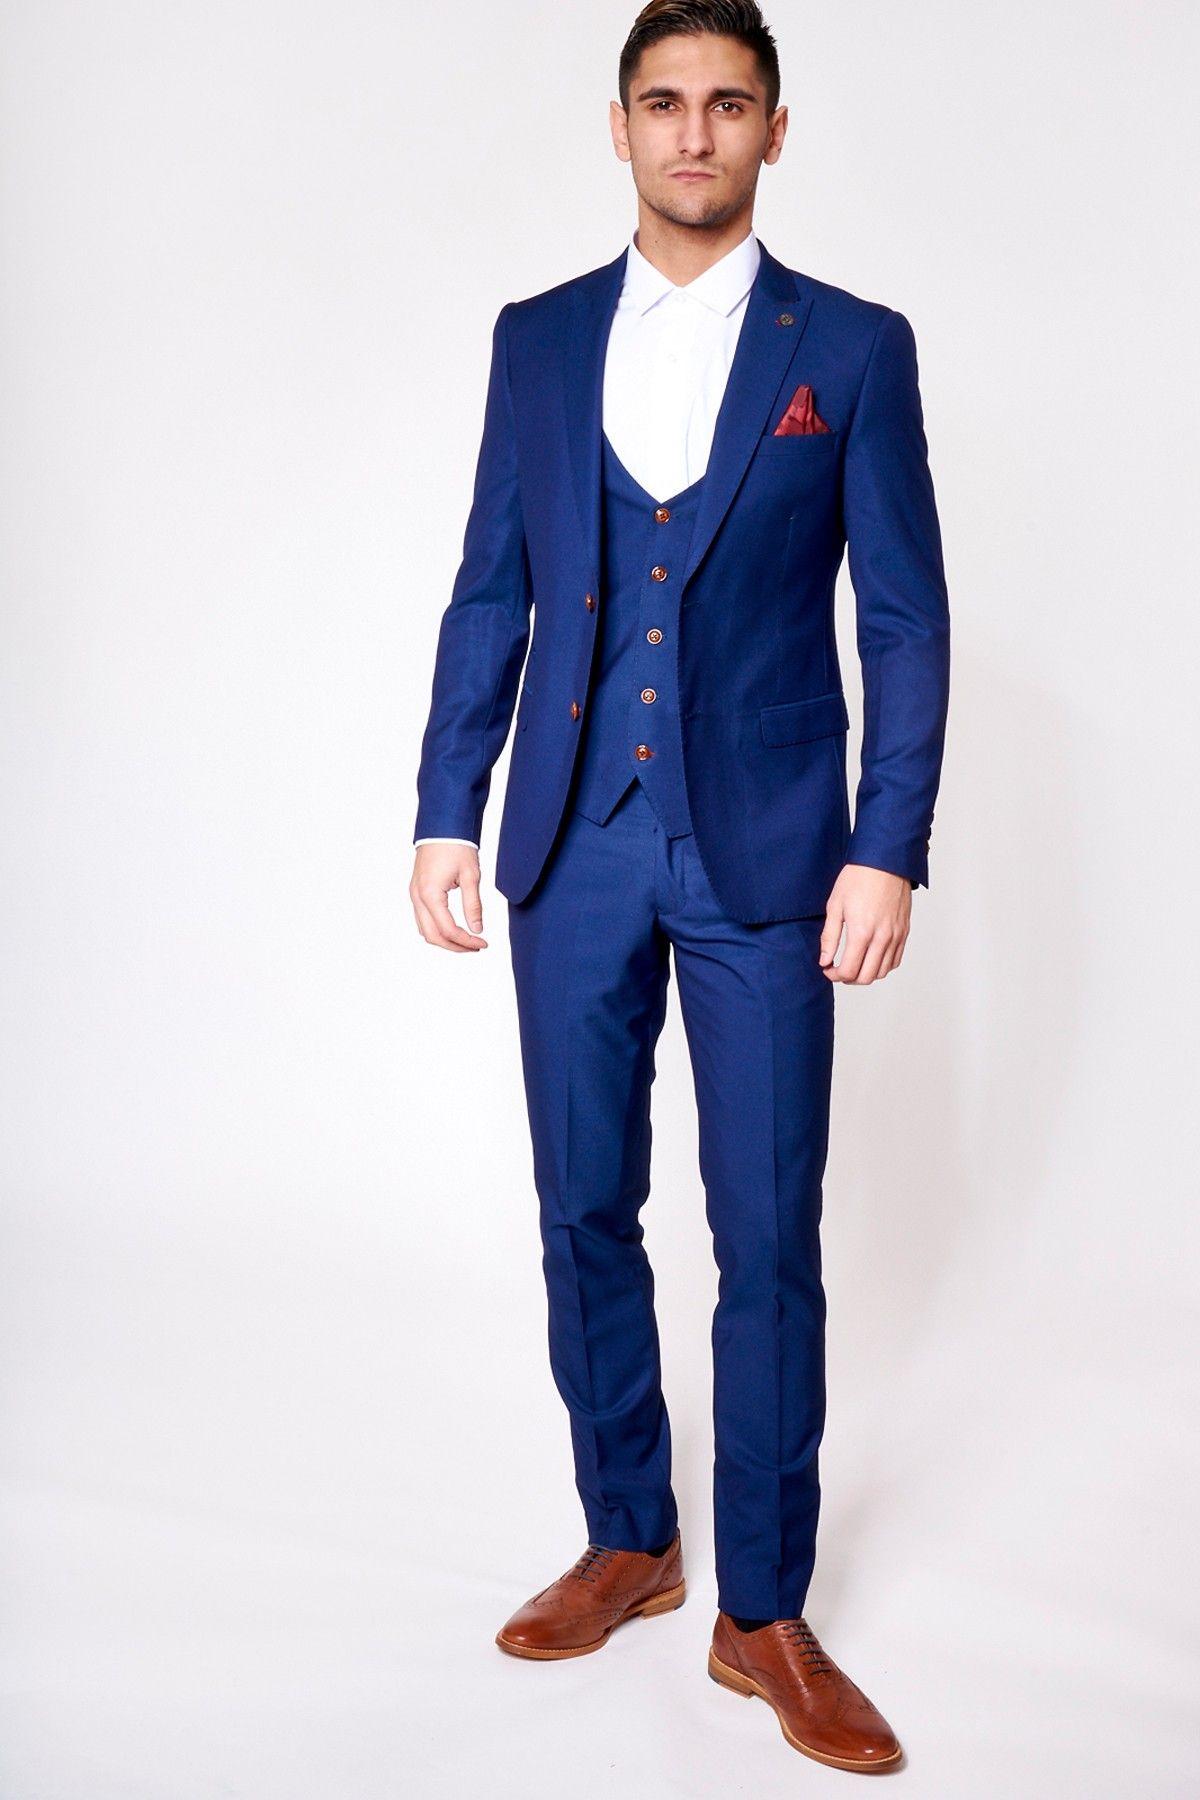 Mens Suit | Three Piece | Navy | Tailored | Belmont | Marc Darcy ...